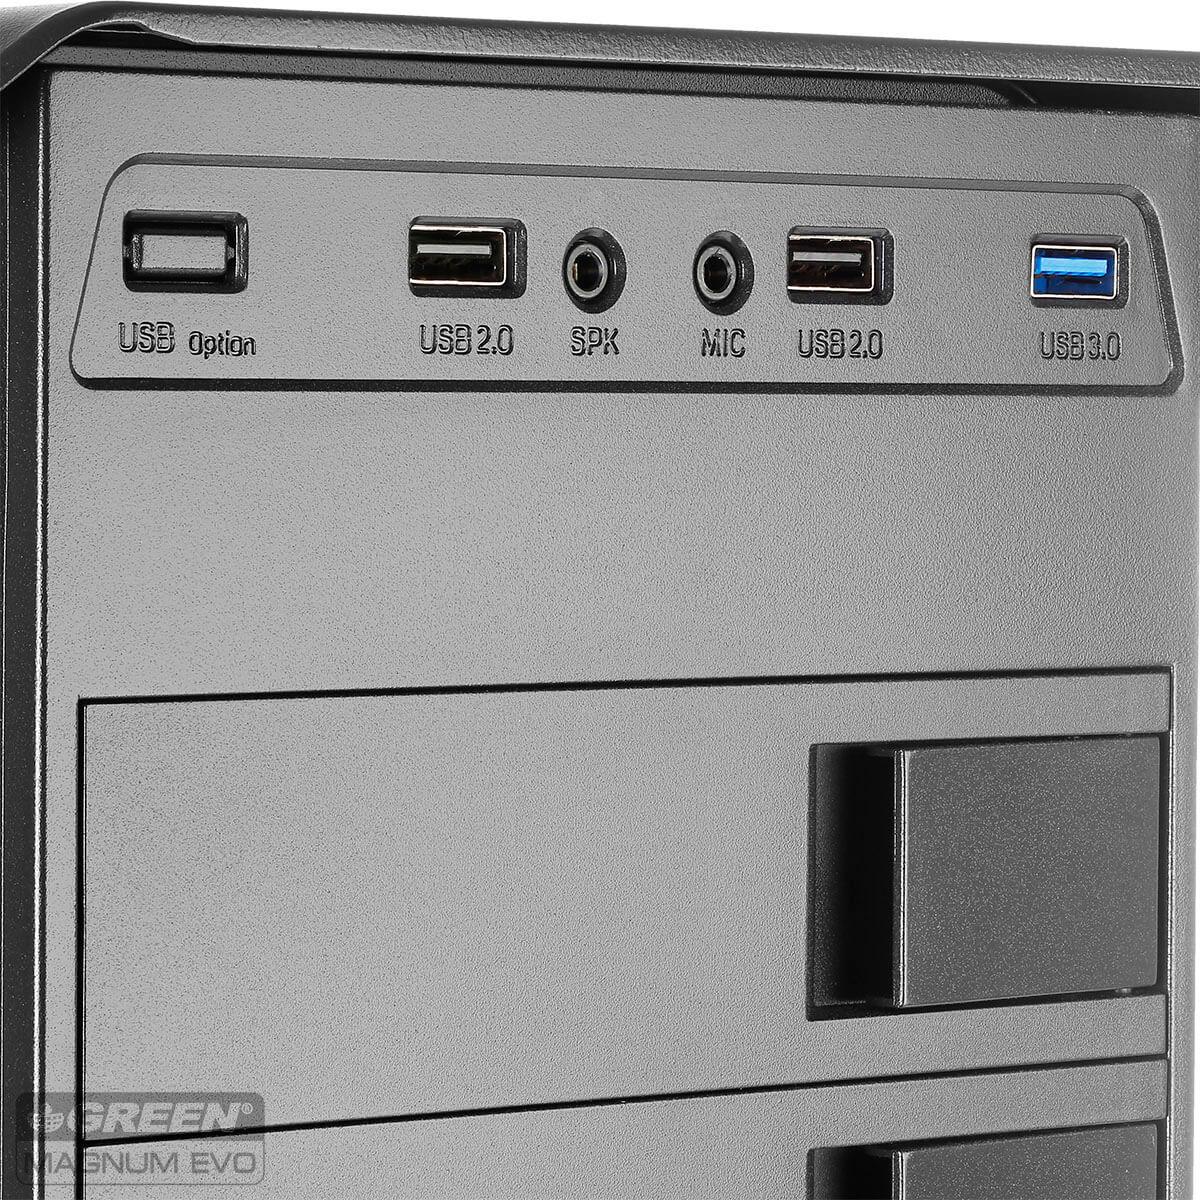 Magnum Evo 10 - کیس کامپیوتر گرین مدل Magnum Evo